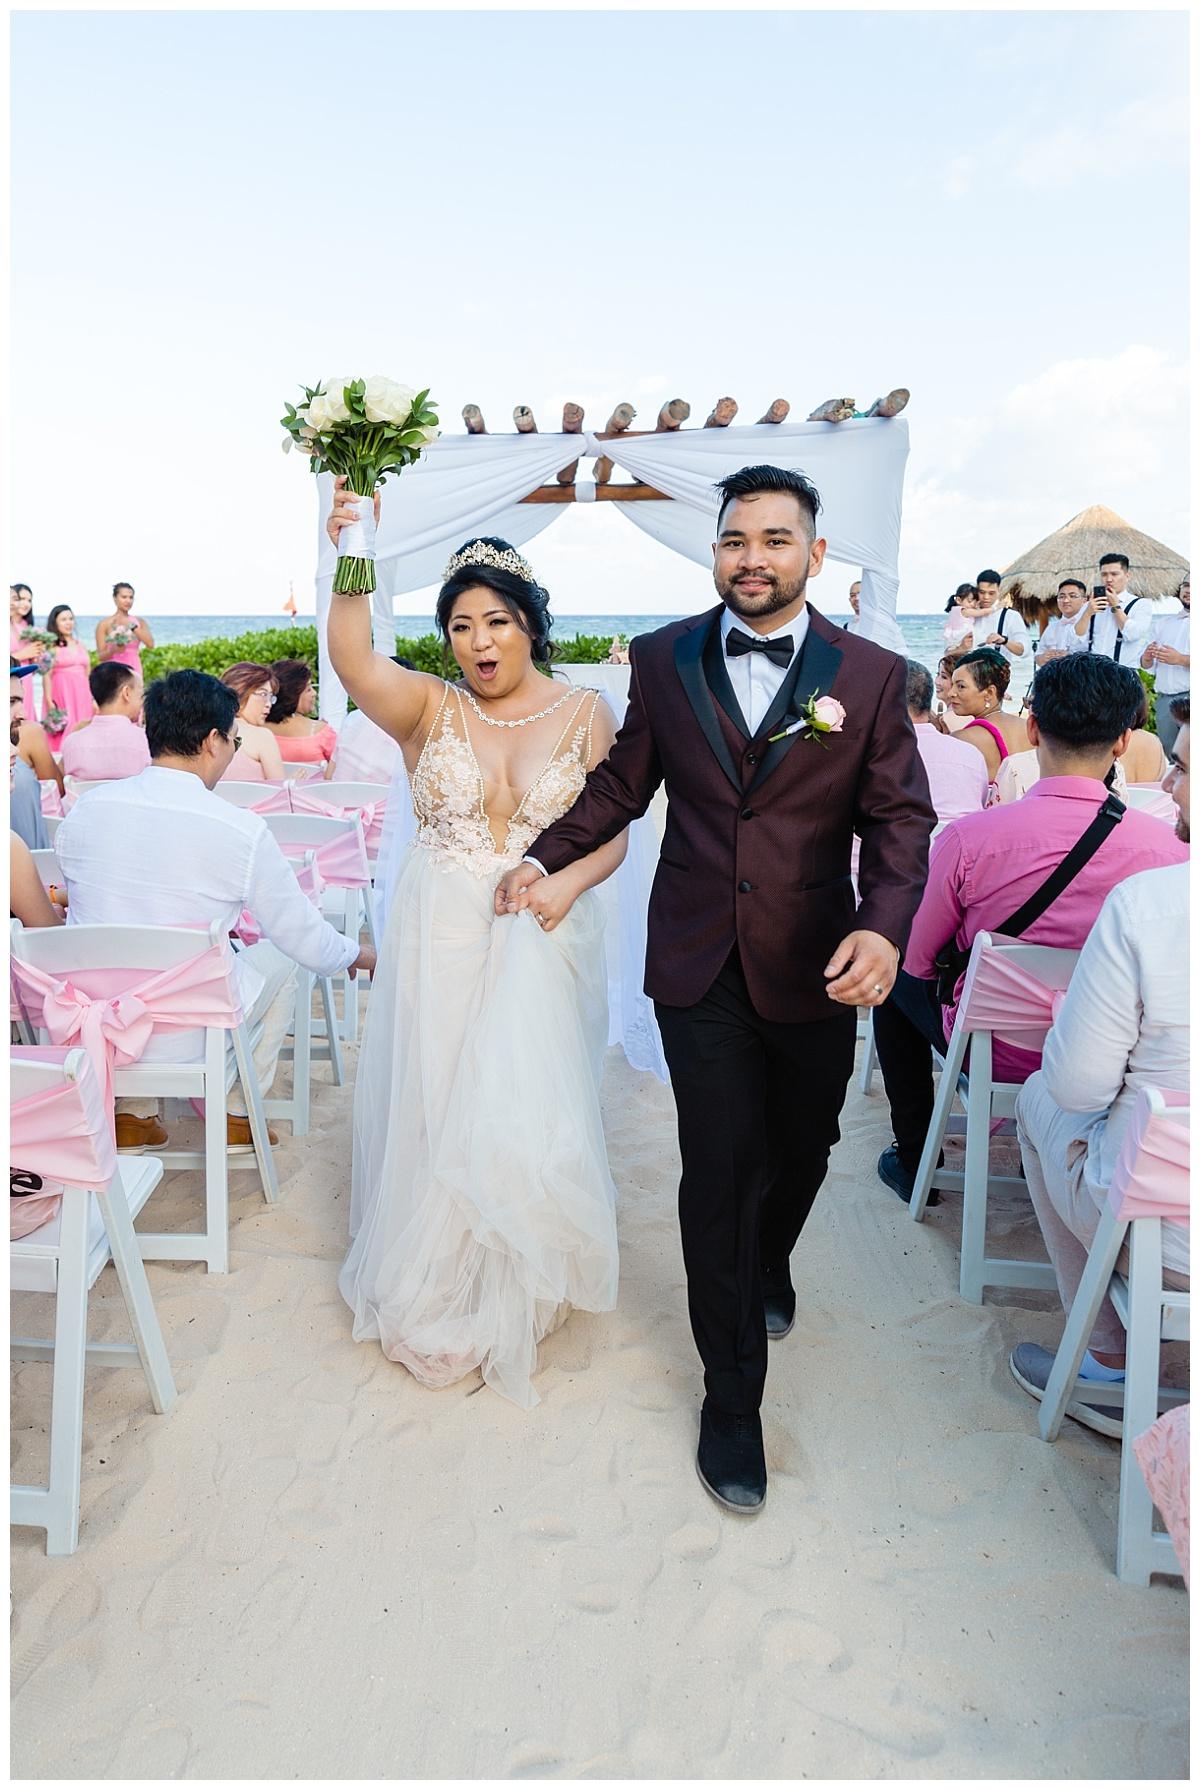 oceans-riviera-paradise-wedding-23.jpg